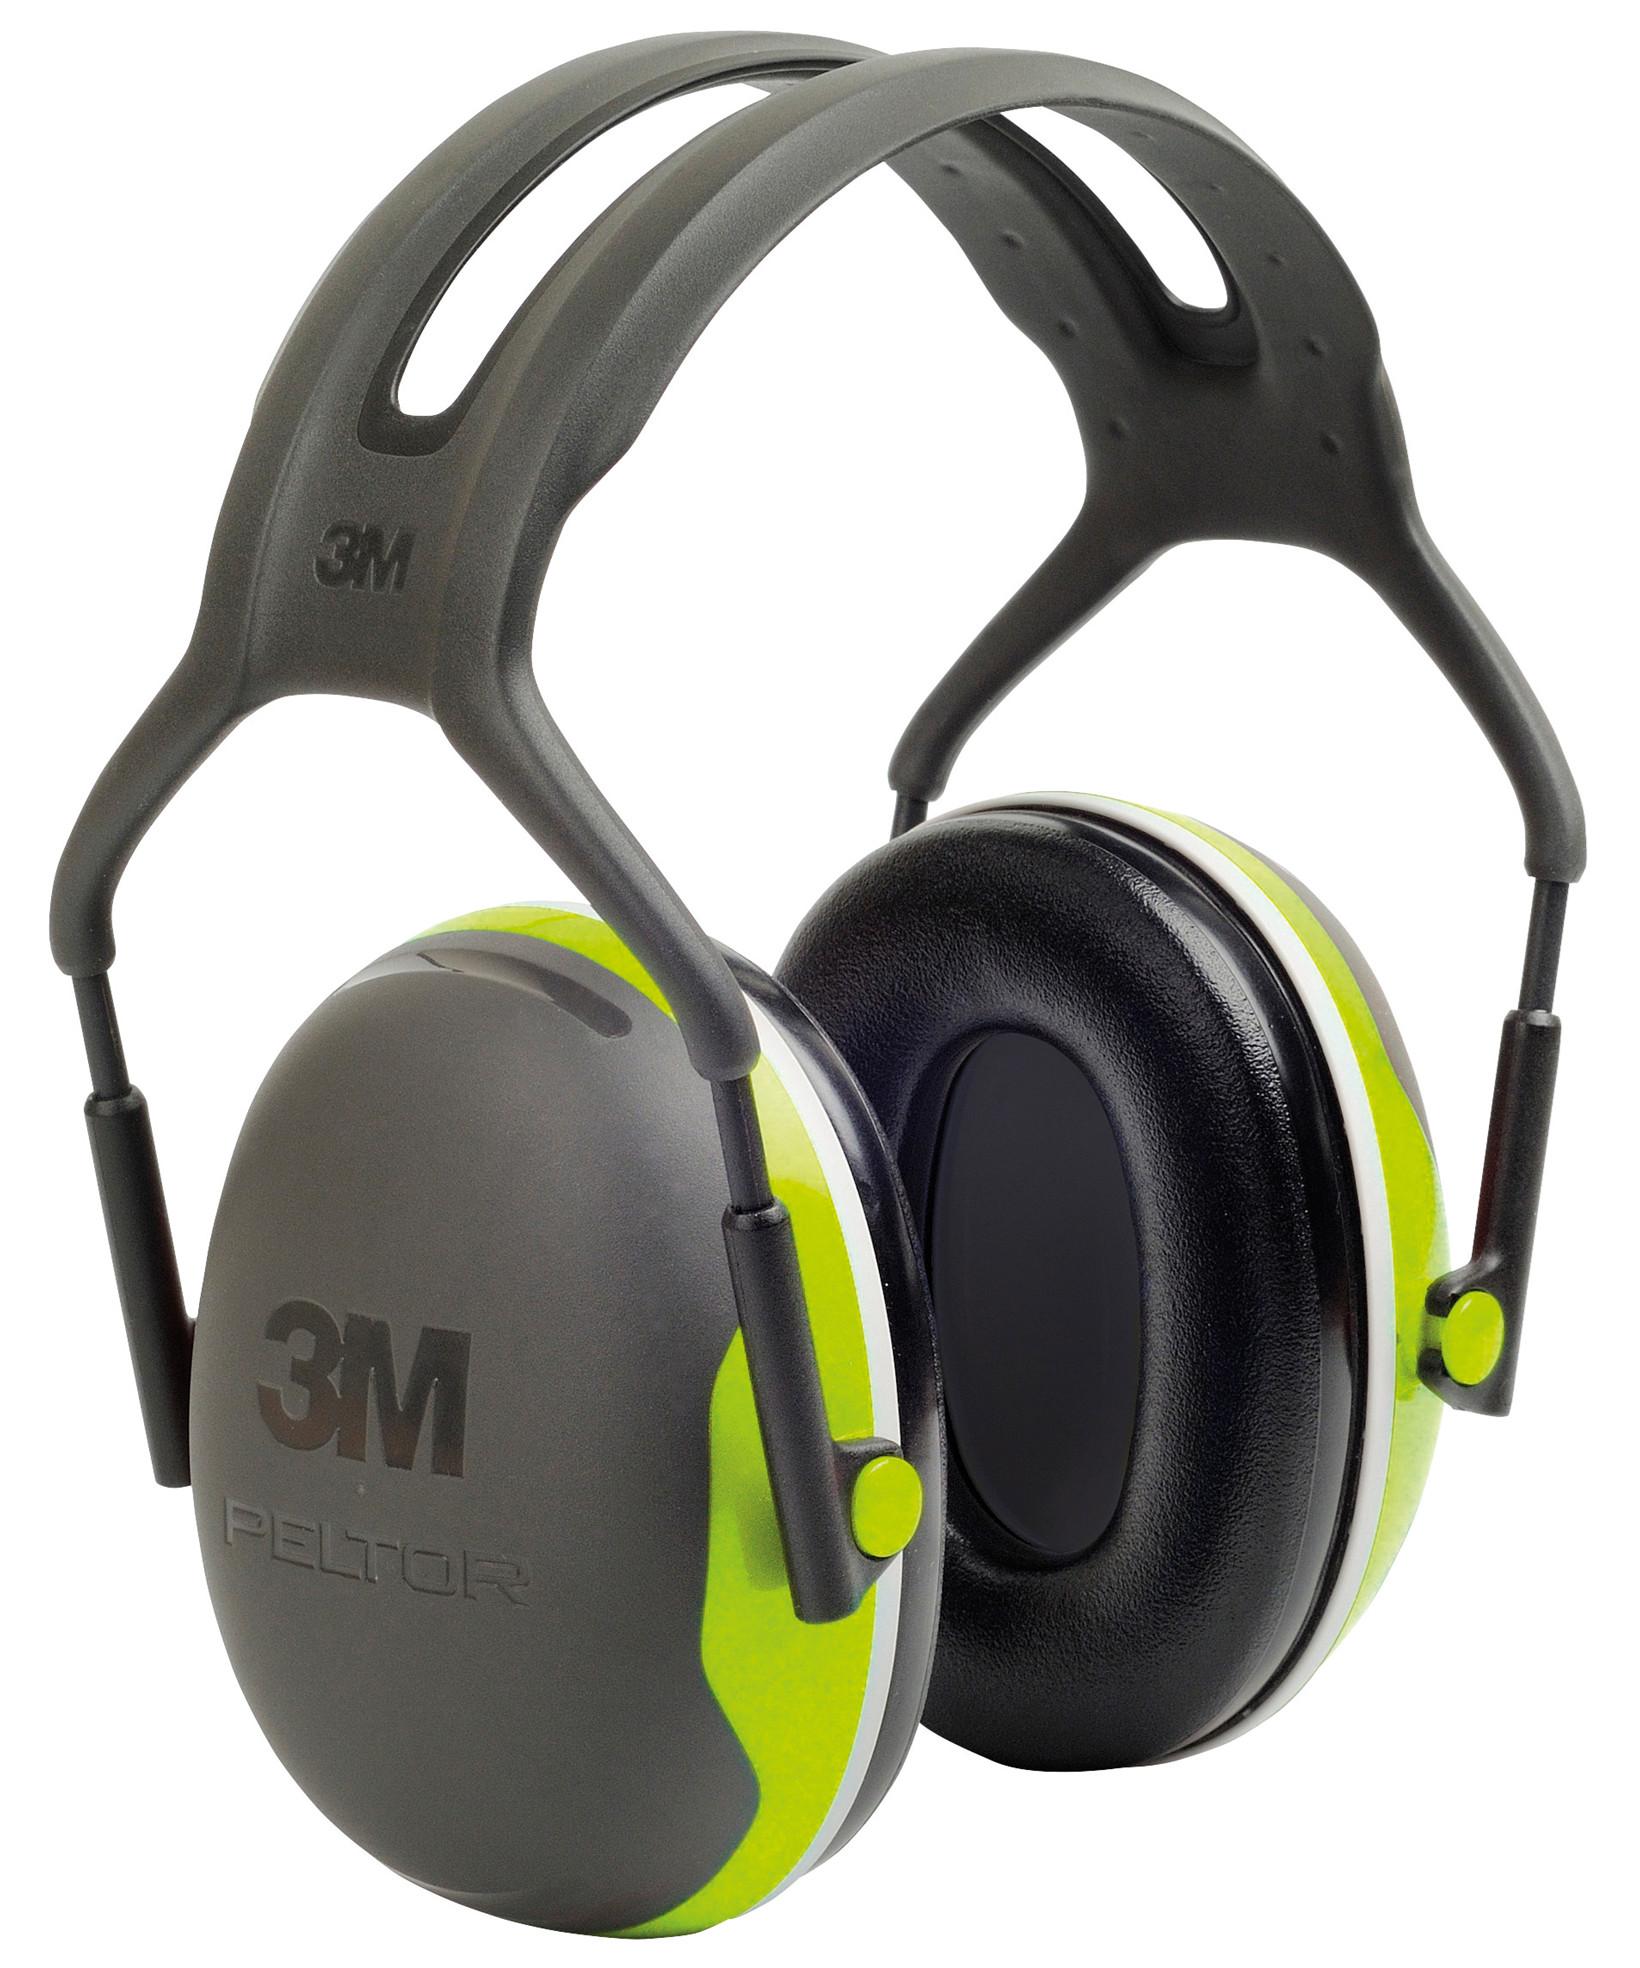 3M Peltor X4A høreværn